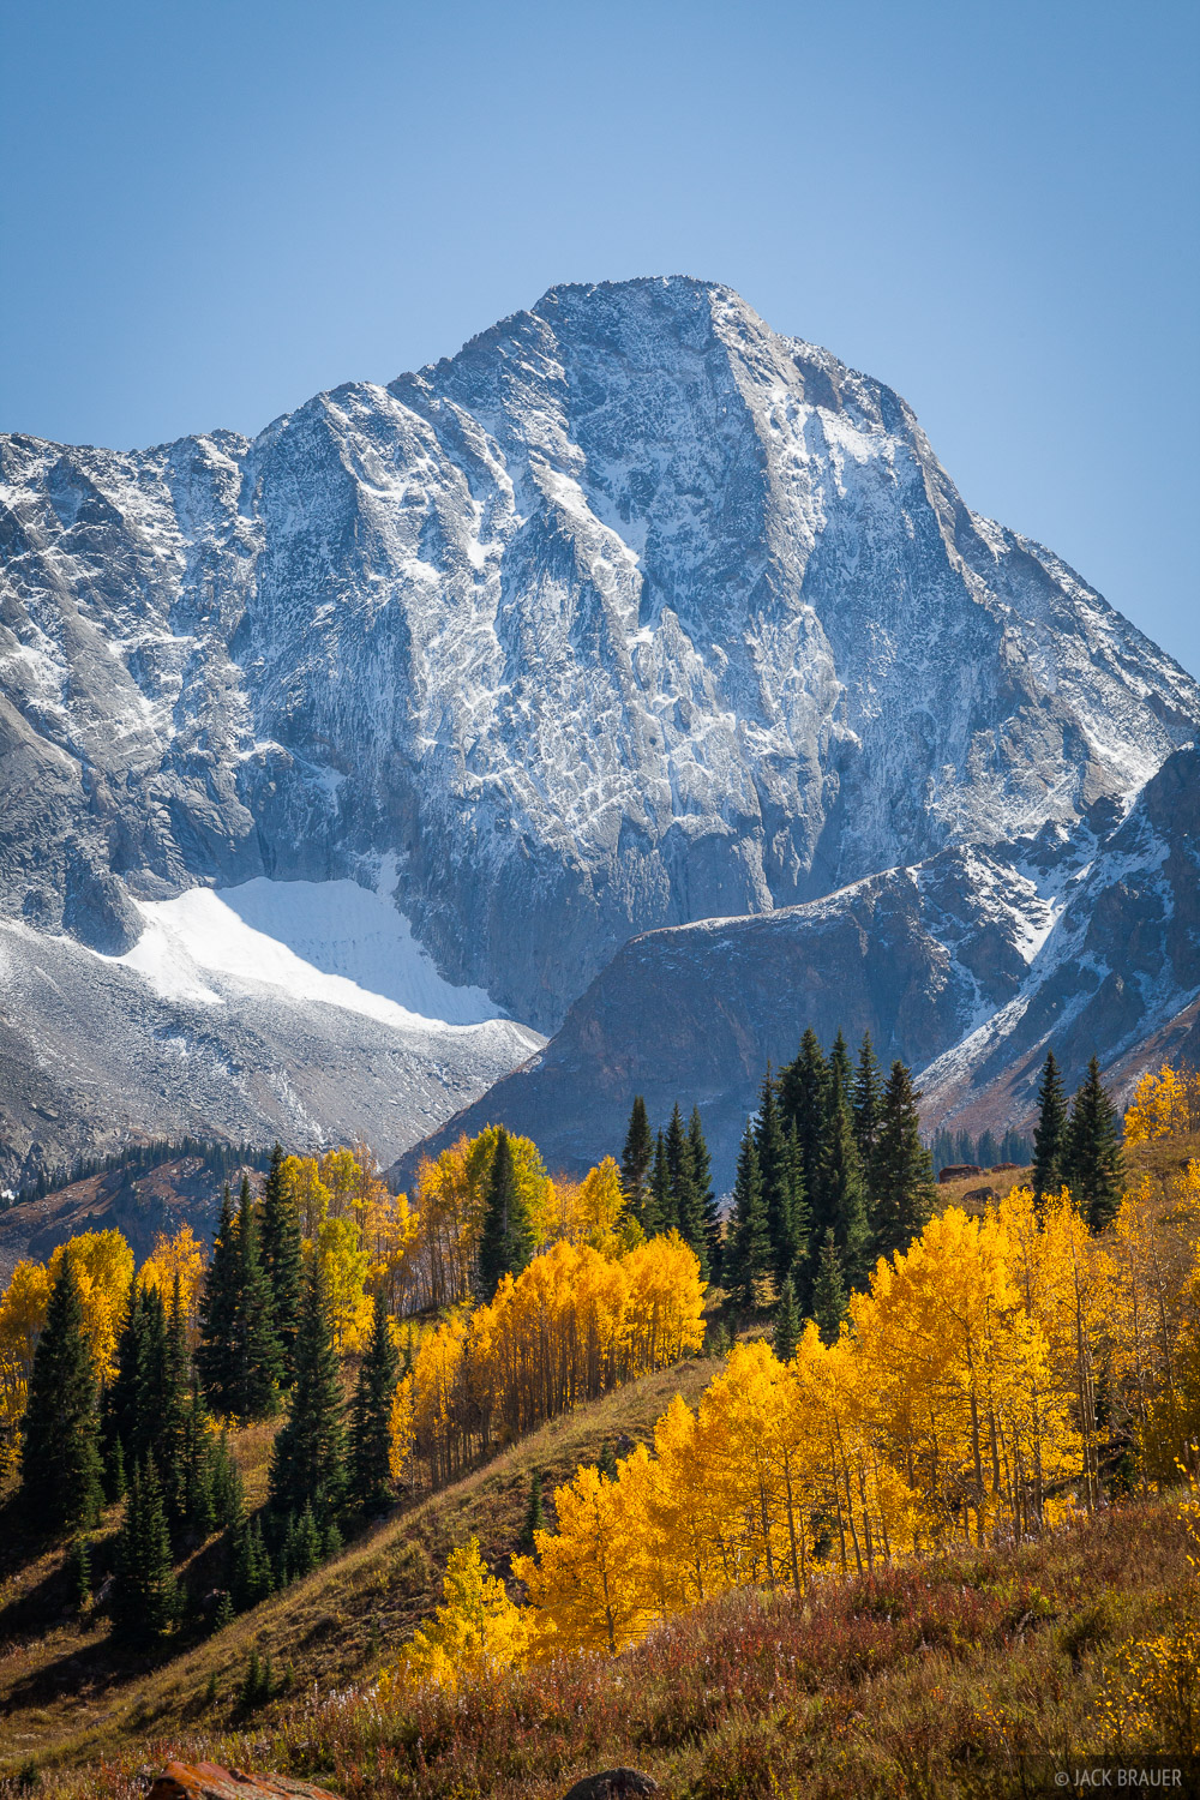 Capitol Peak, Colorado, Elk Mountains, aspens, autumn, fall, Maroon Bells-Snowmass Wilderness, photo